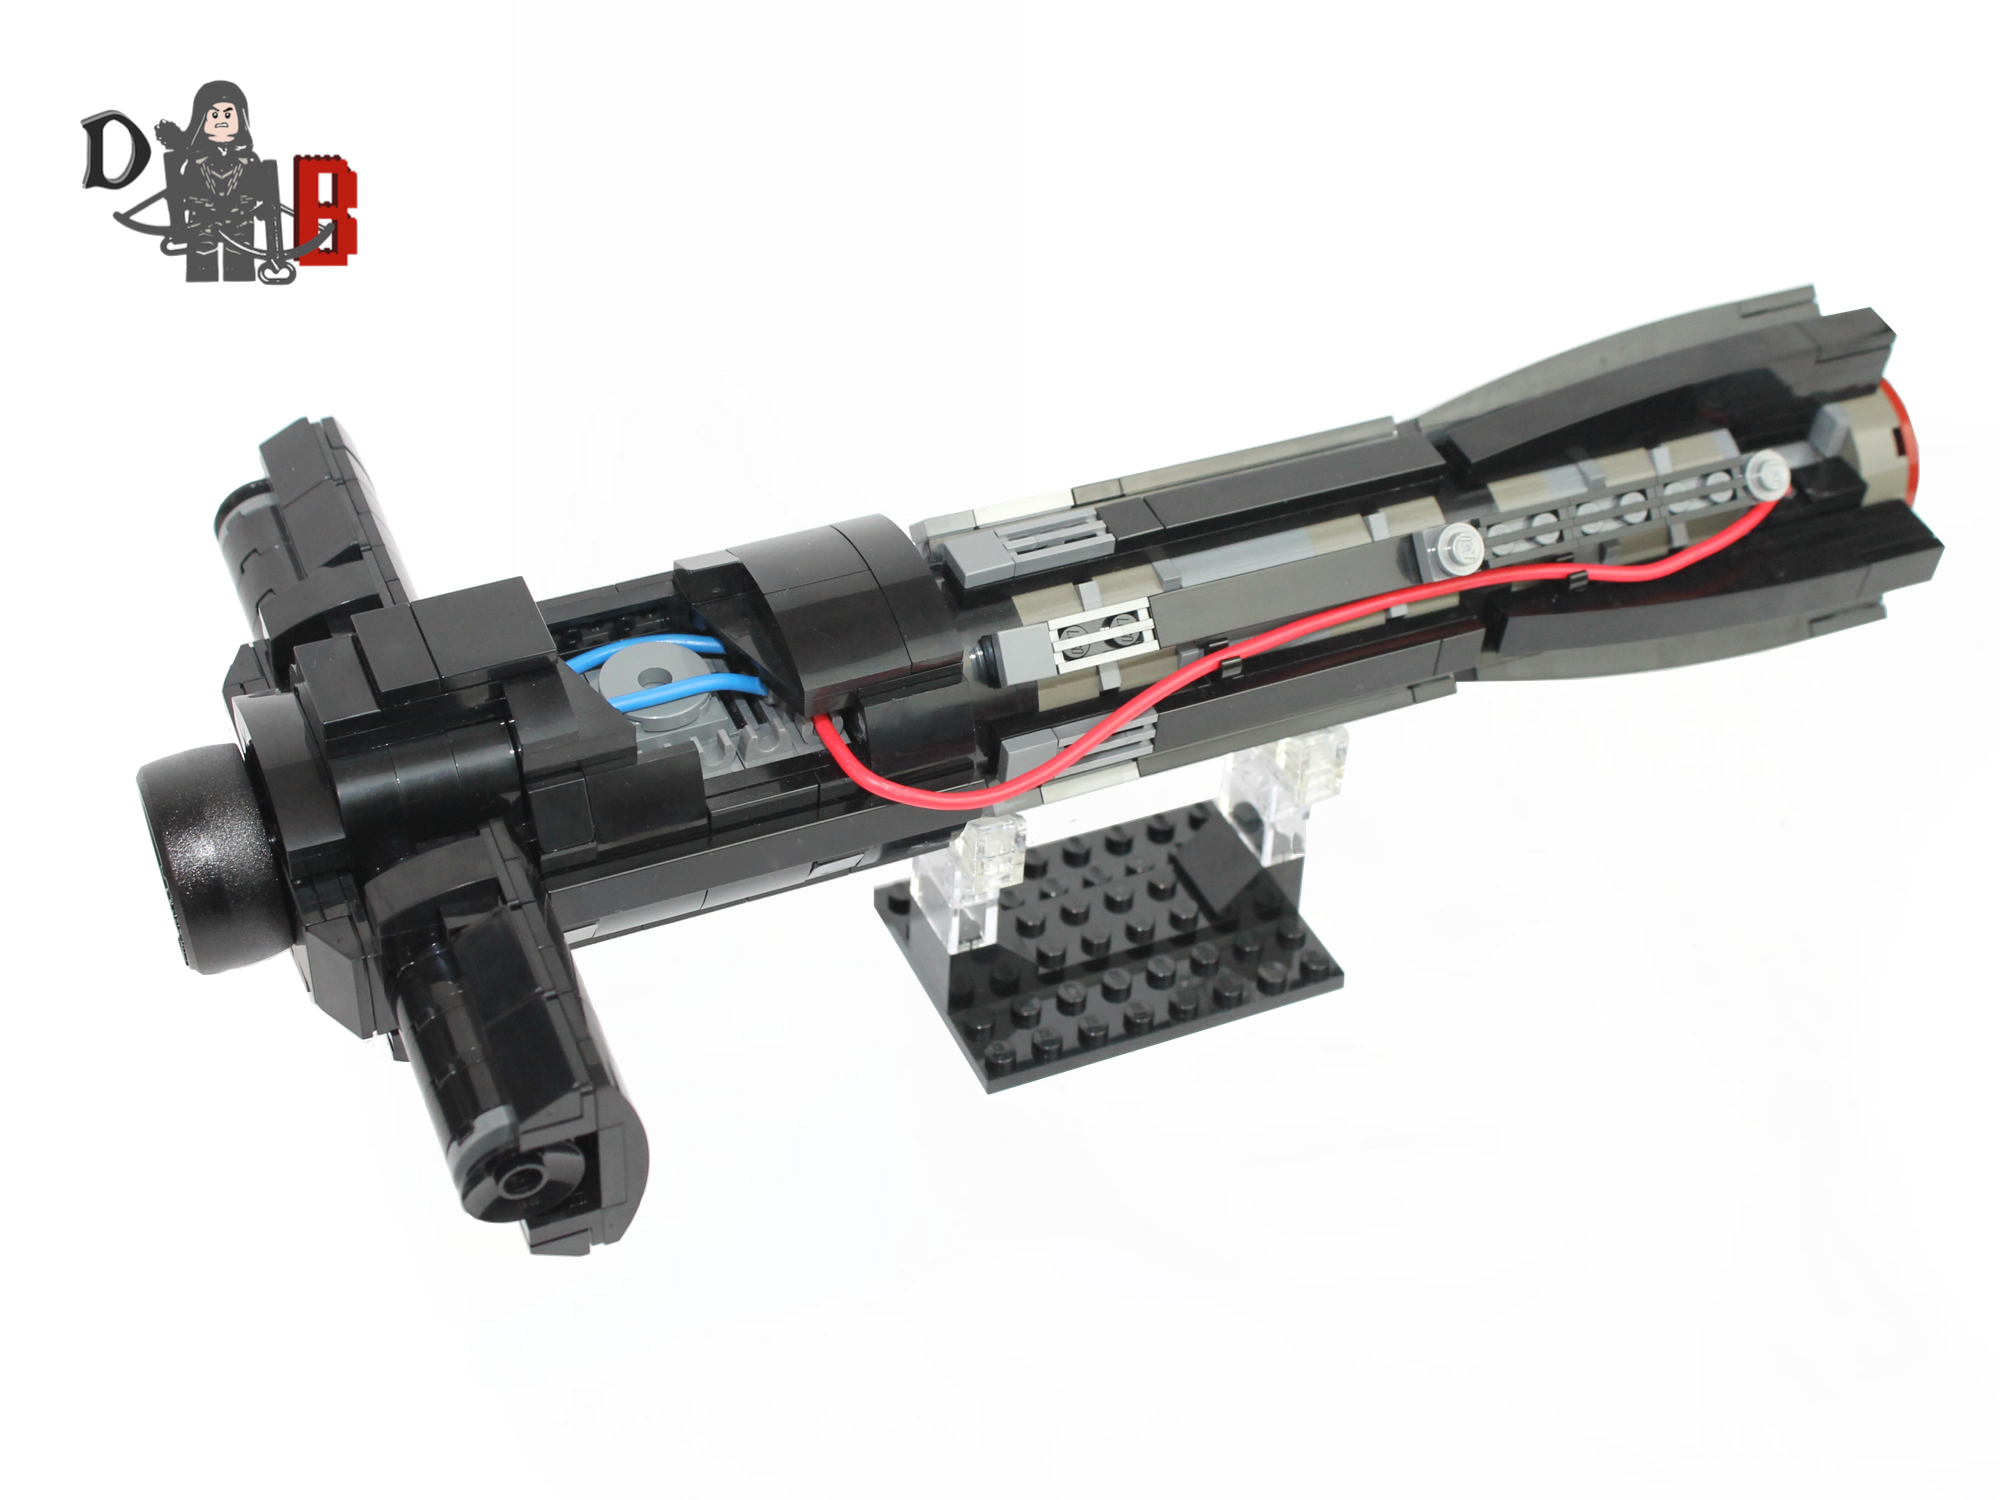 Lego kylo ren lightsaber main